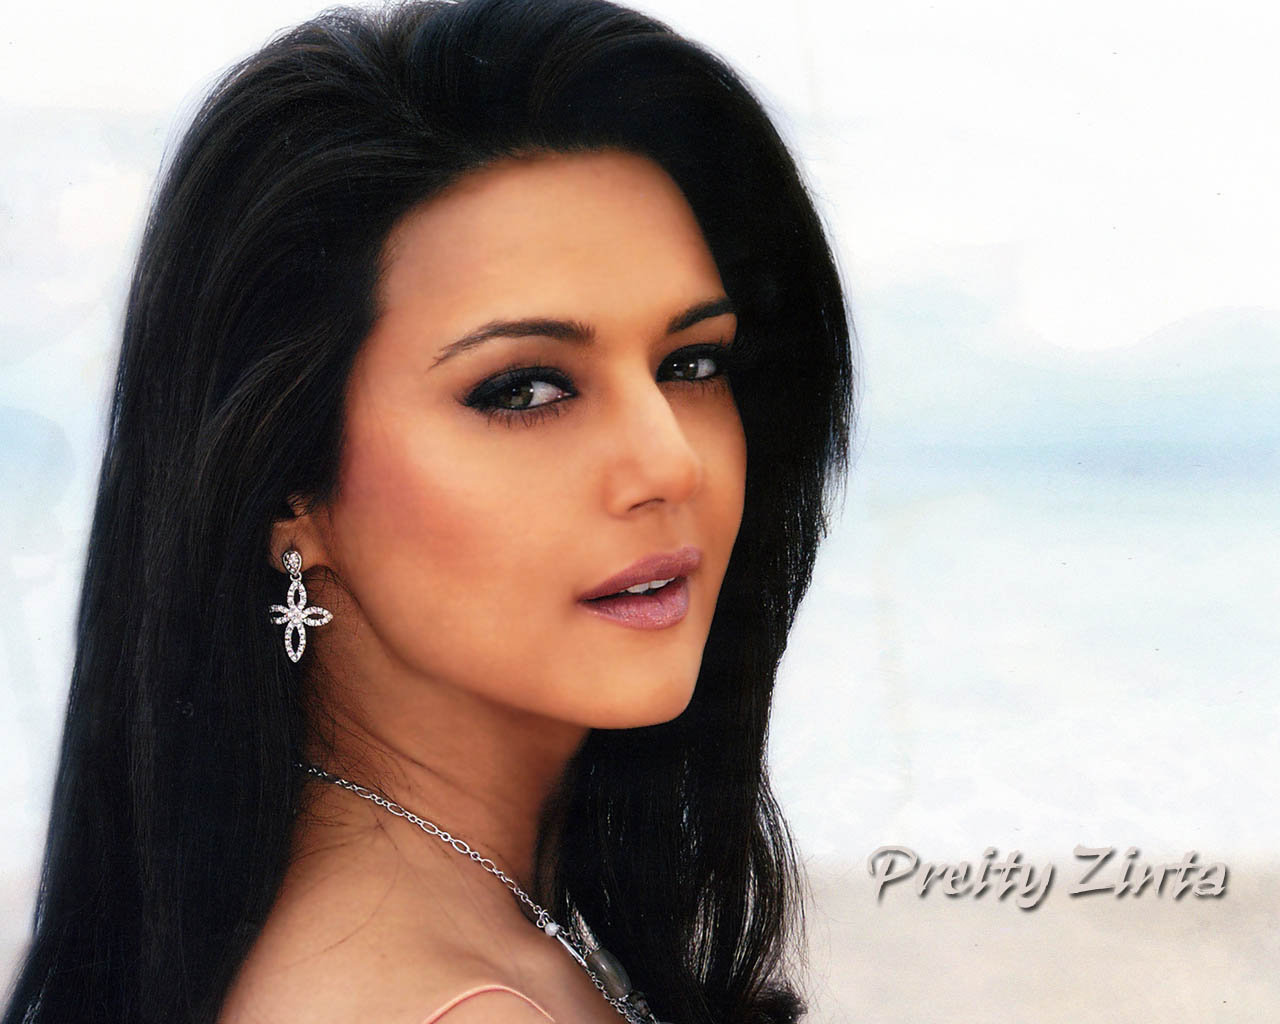 Very Hot Preity Zinta Pictures  Celeb Hot Pics  Celeb -8024